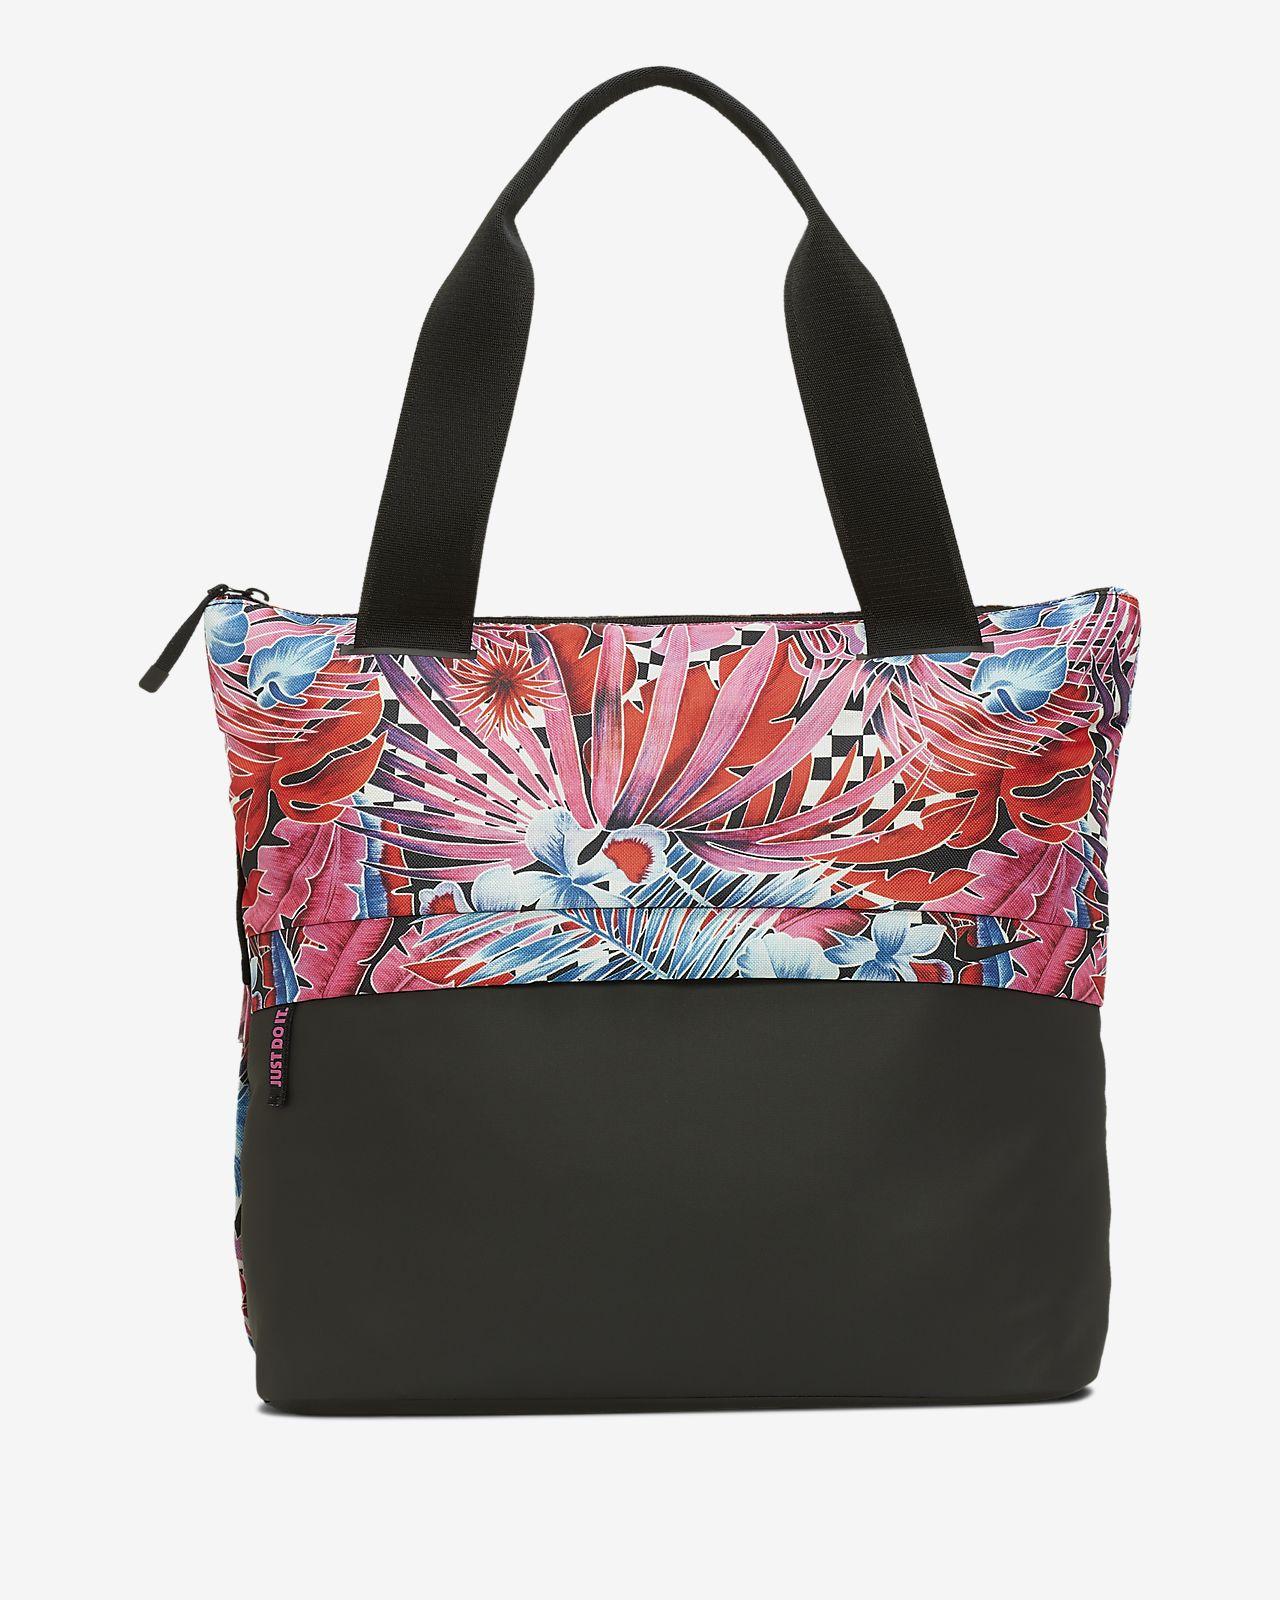 Nike Radiate Women's Training Tote Bag